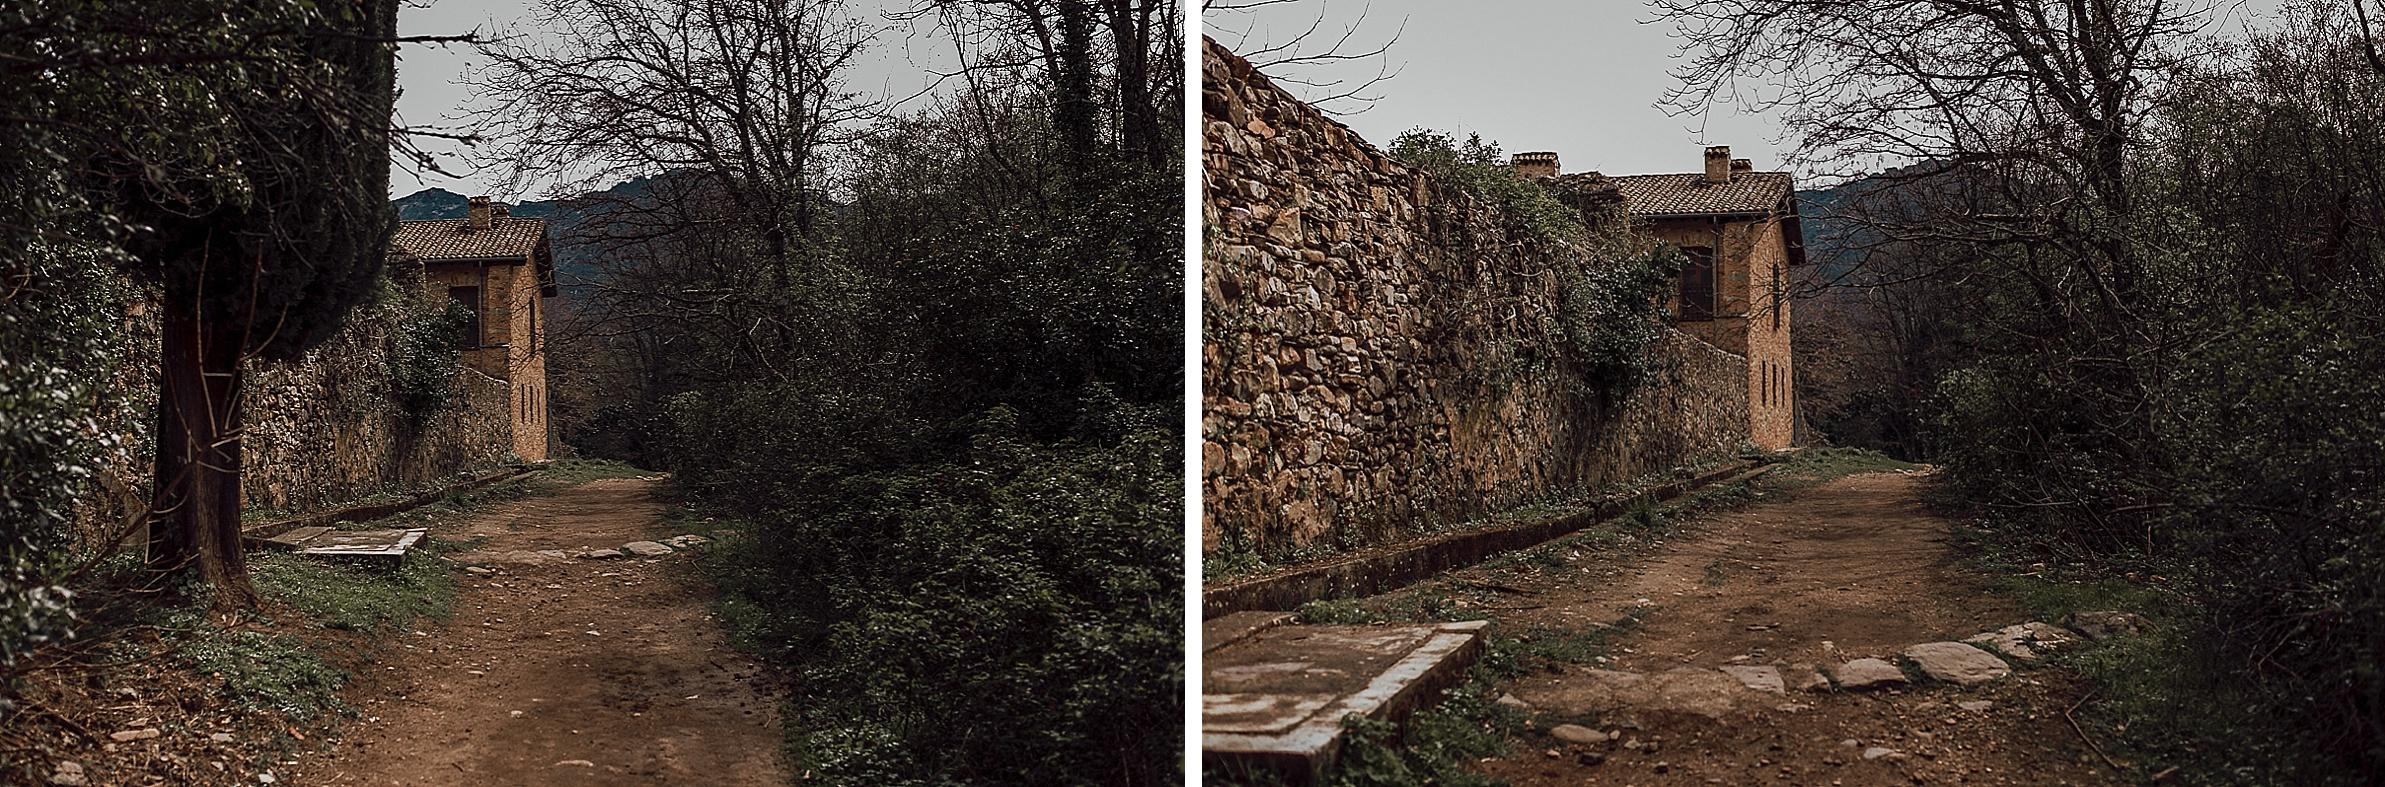 Fotografo-Salamanca-FedeGrau-23-.jpg